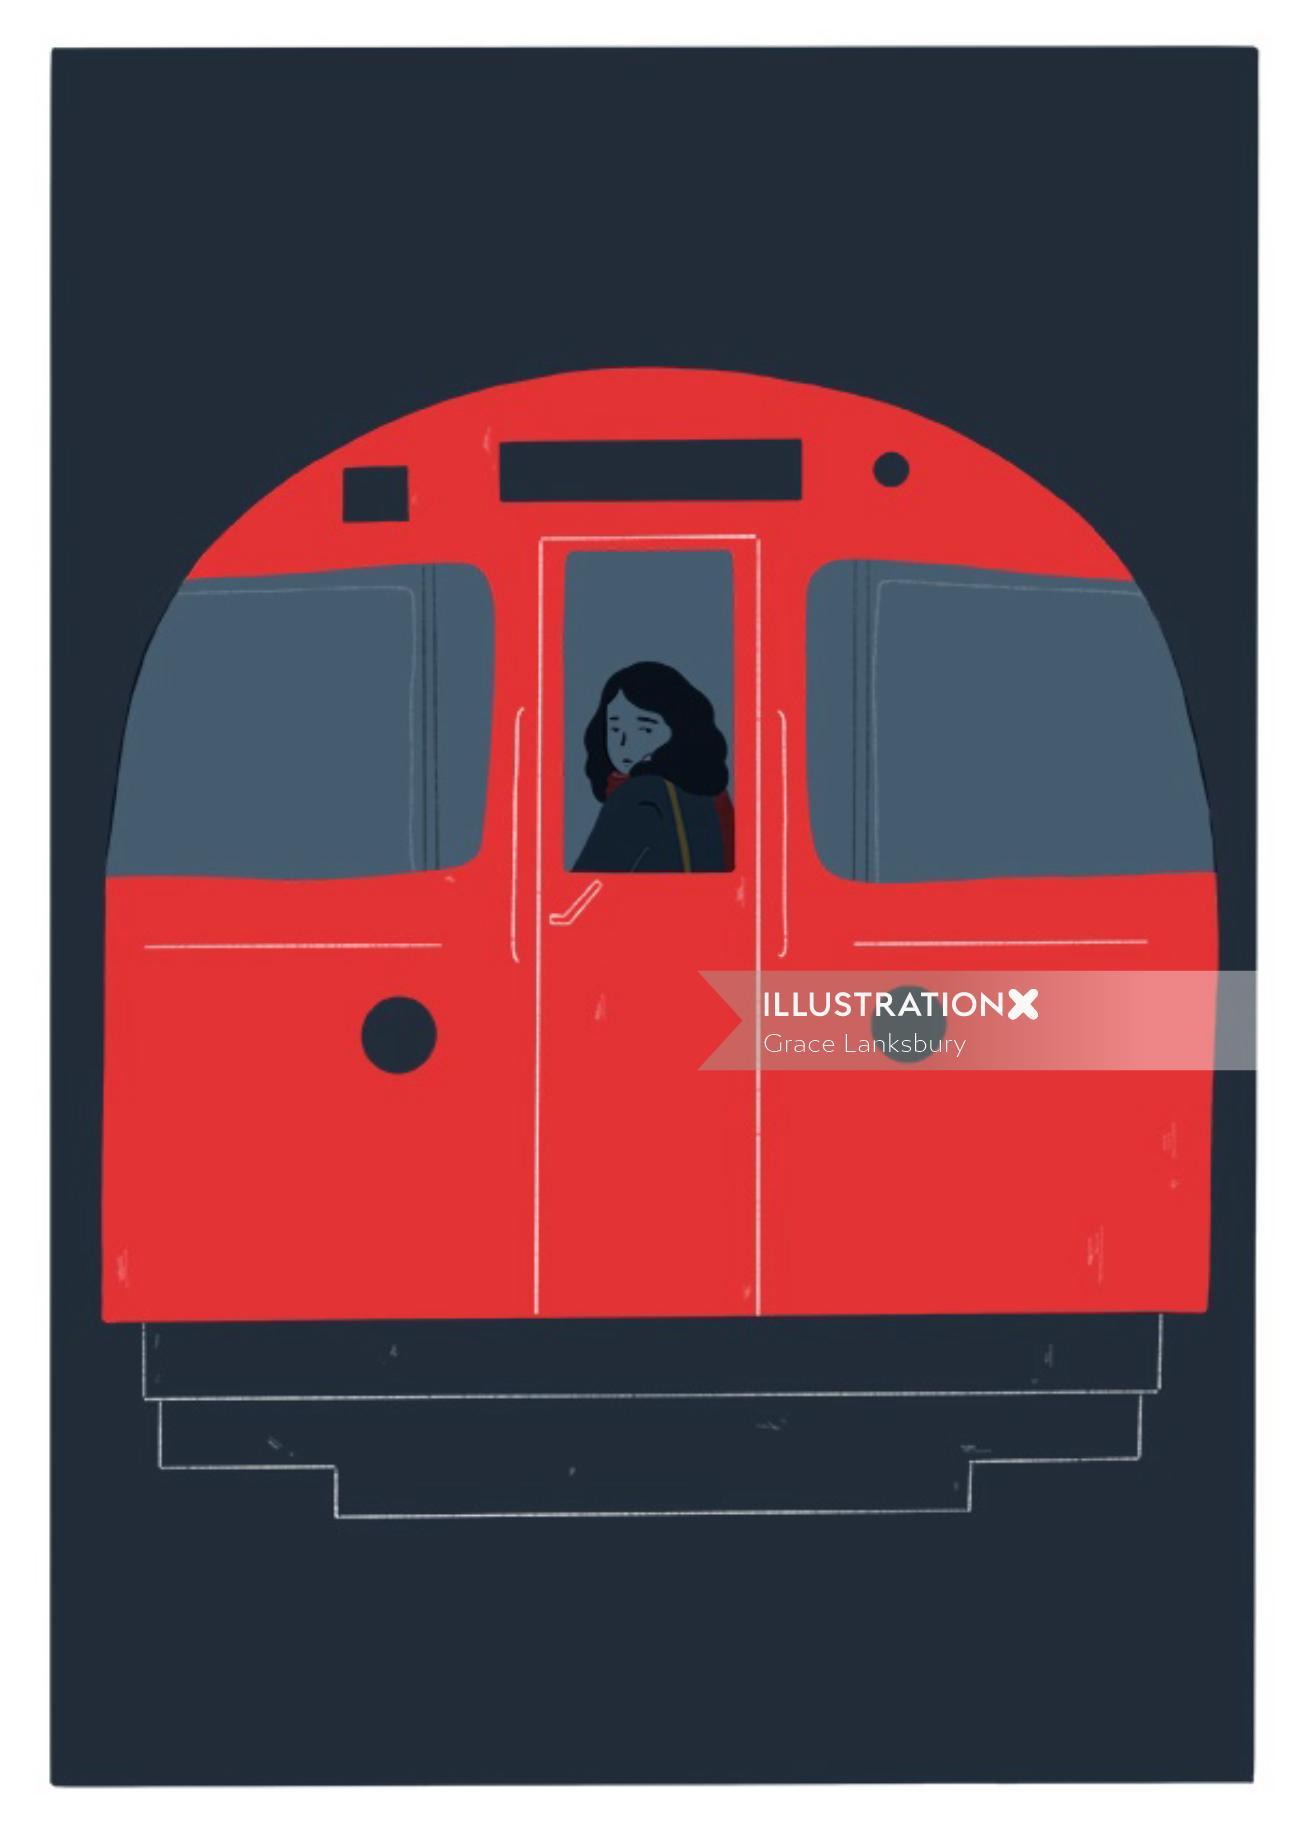 Digital painting of train traveling